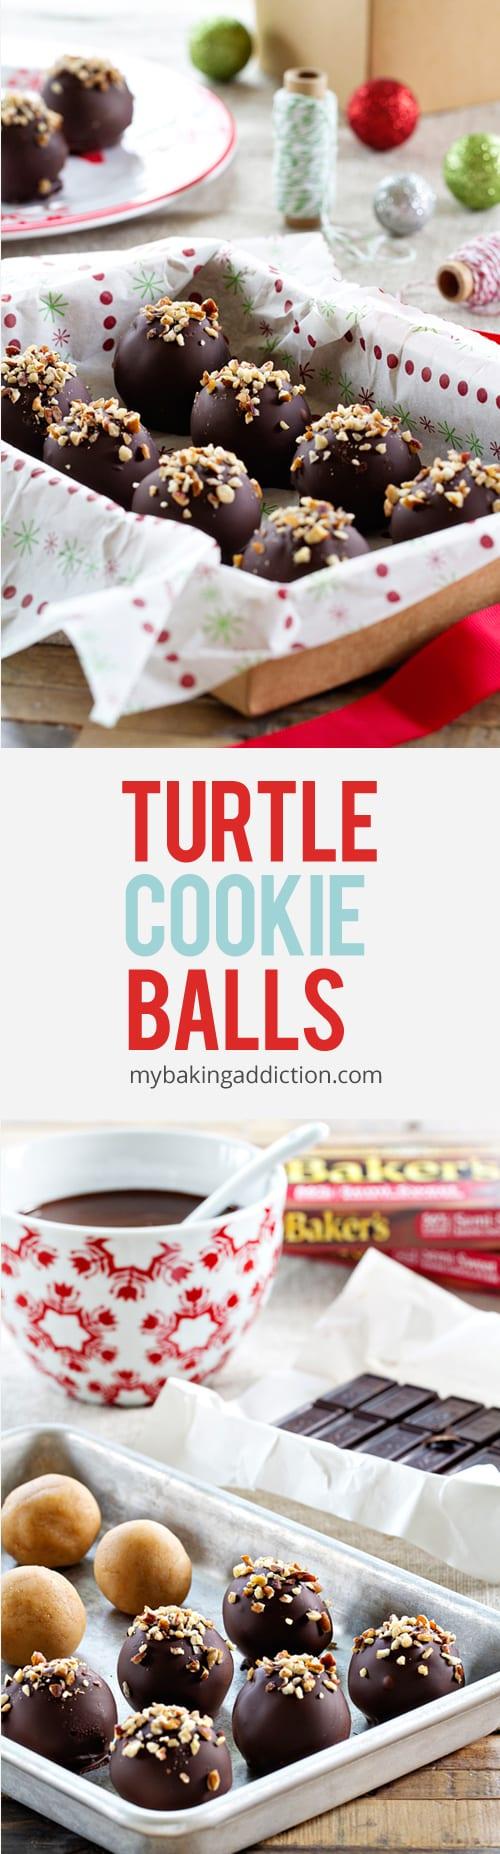 Turtle Cookie Balls | My Baking Addiction #truffesauchocolat